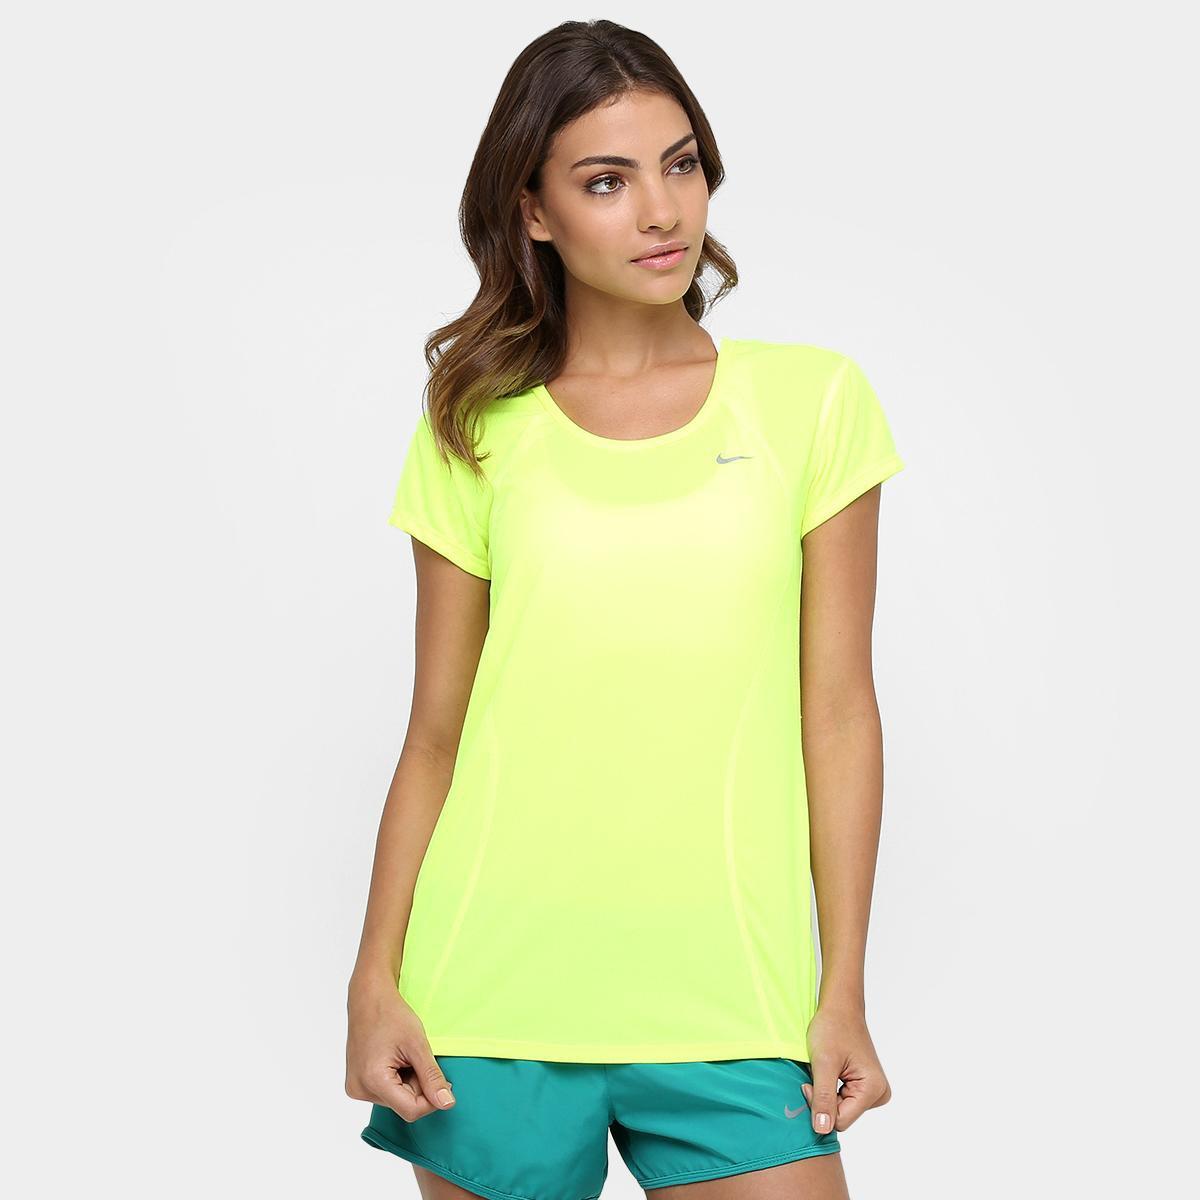 1c3710fb283b4 Camiseta Nike Dri-Fit Racer - Compre Agora